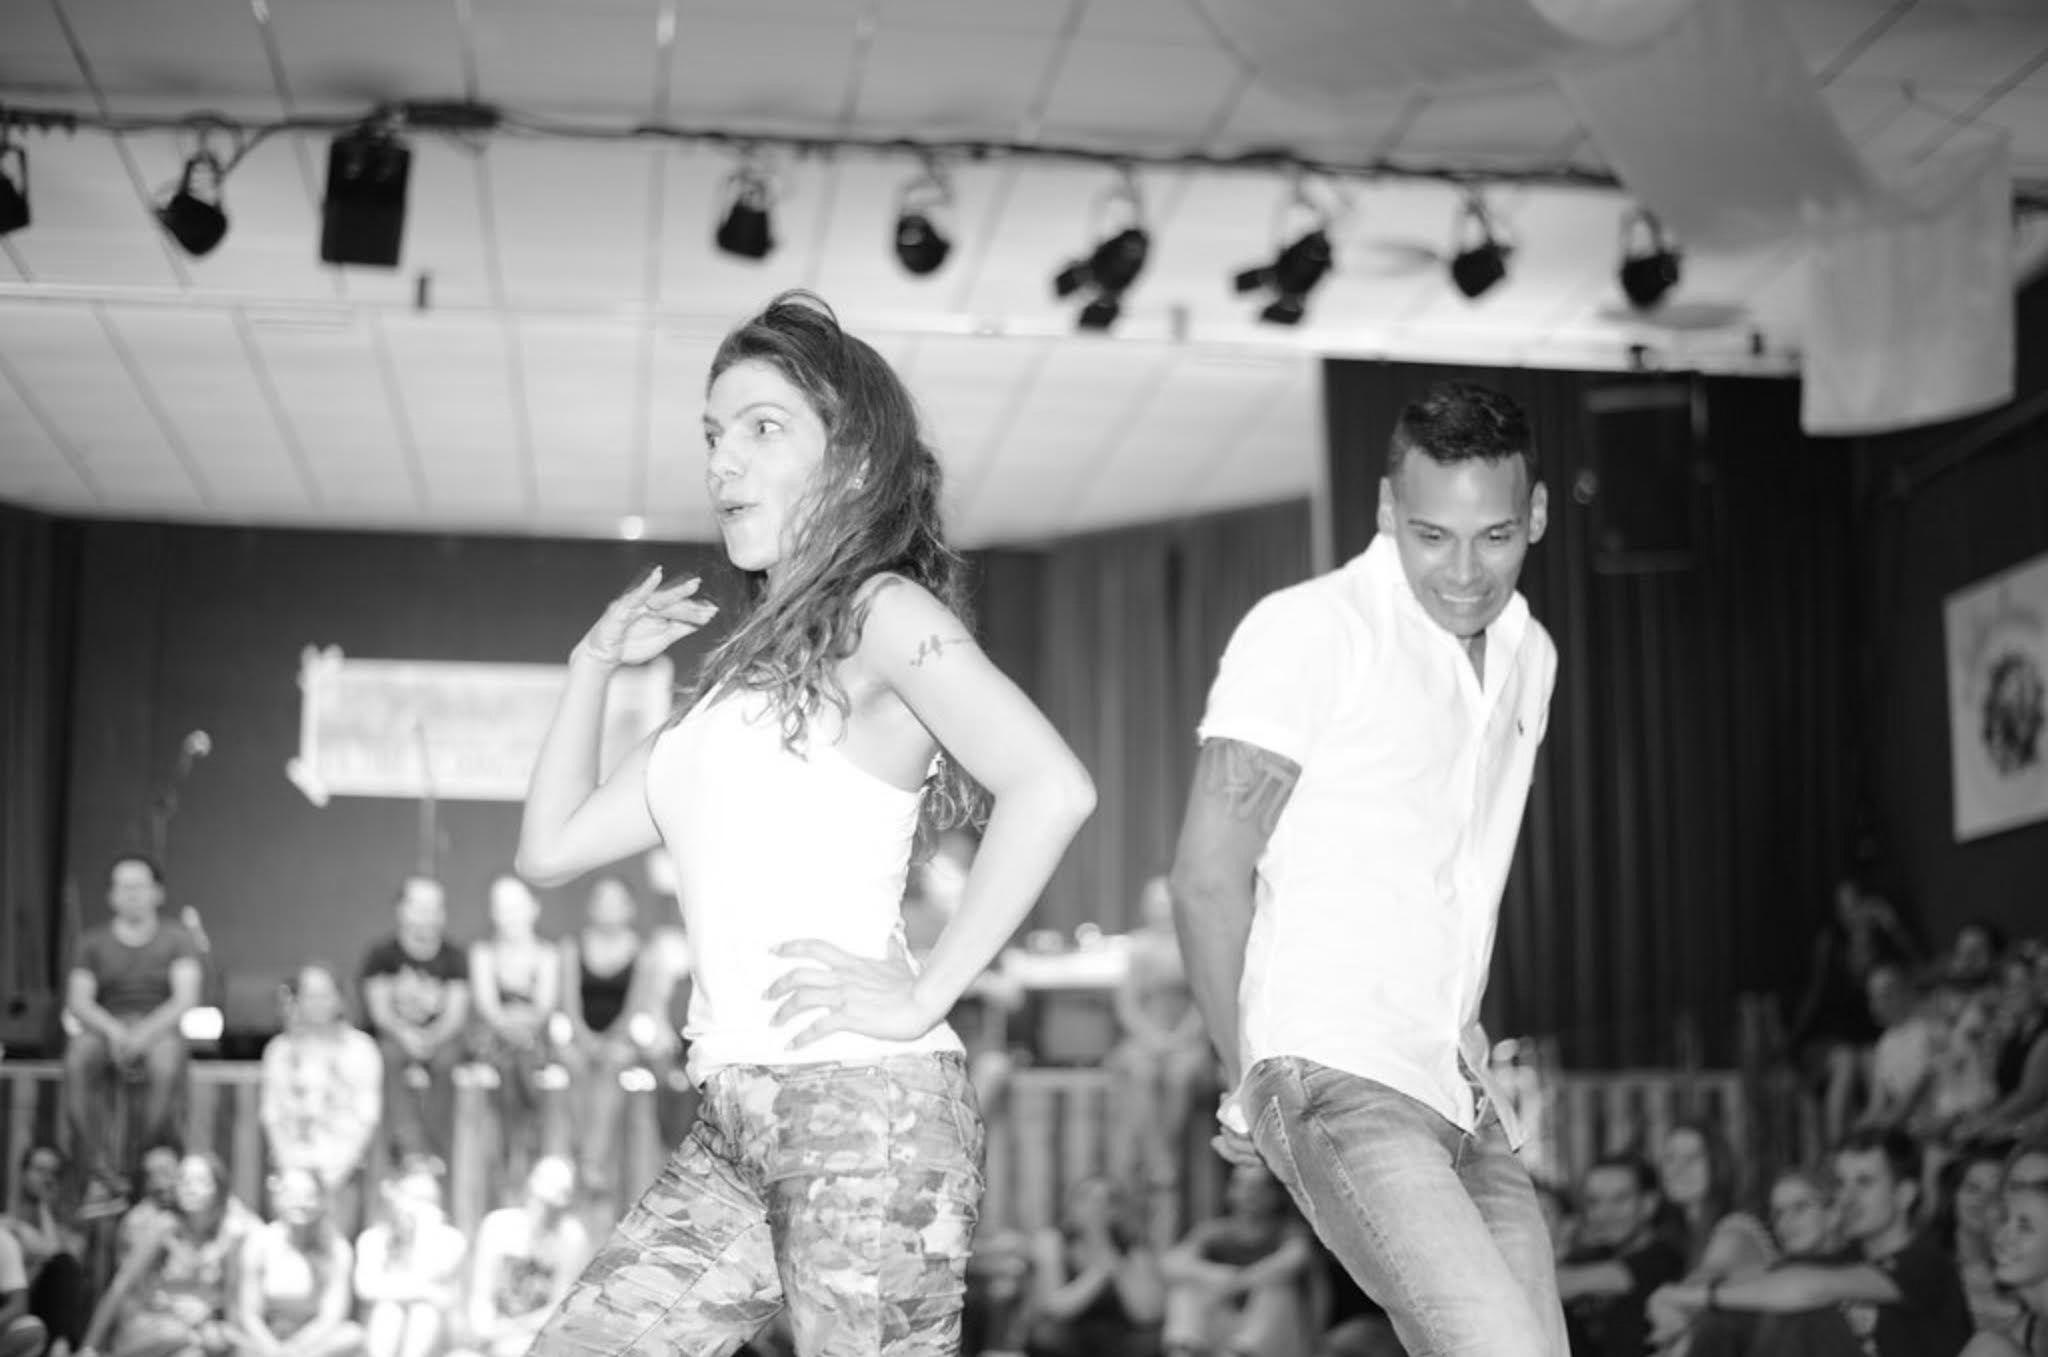 Fábio Reis & Mileide Alexandre